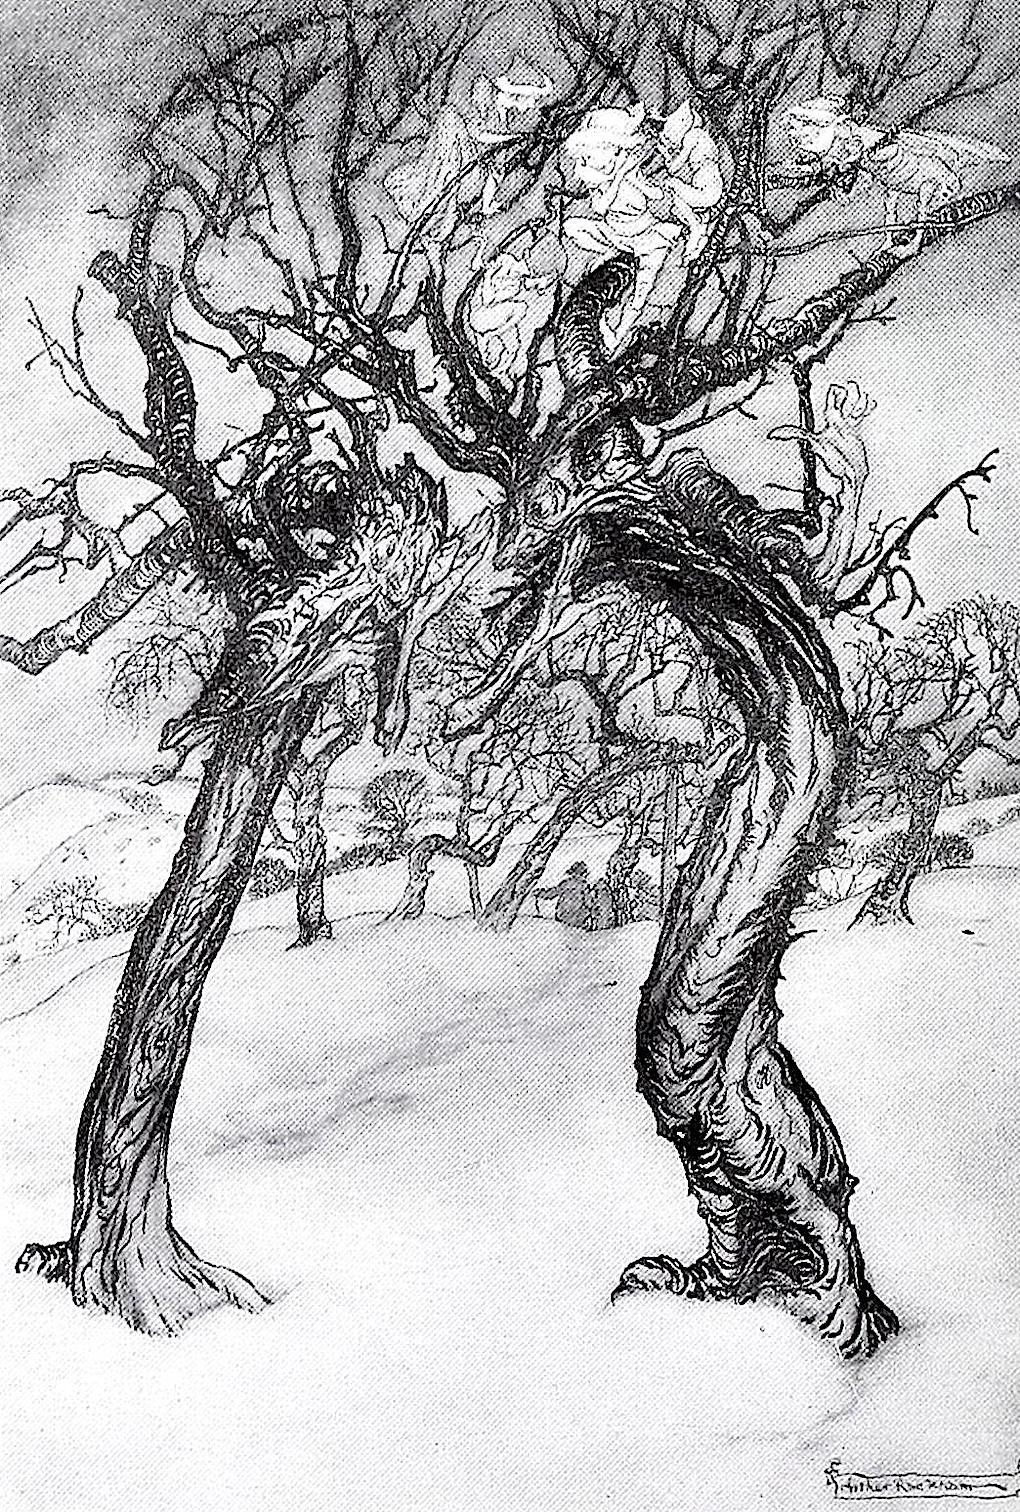 talking trees by illustrator Arthur Rackham